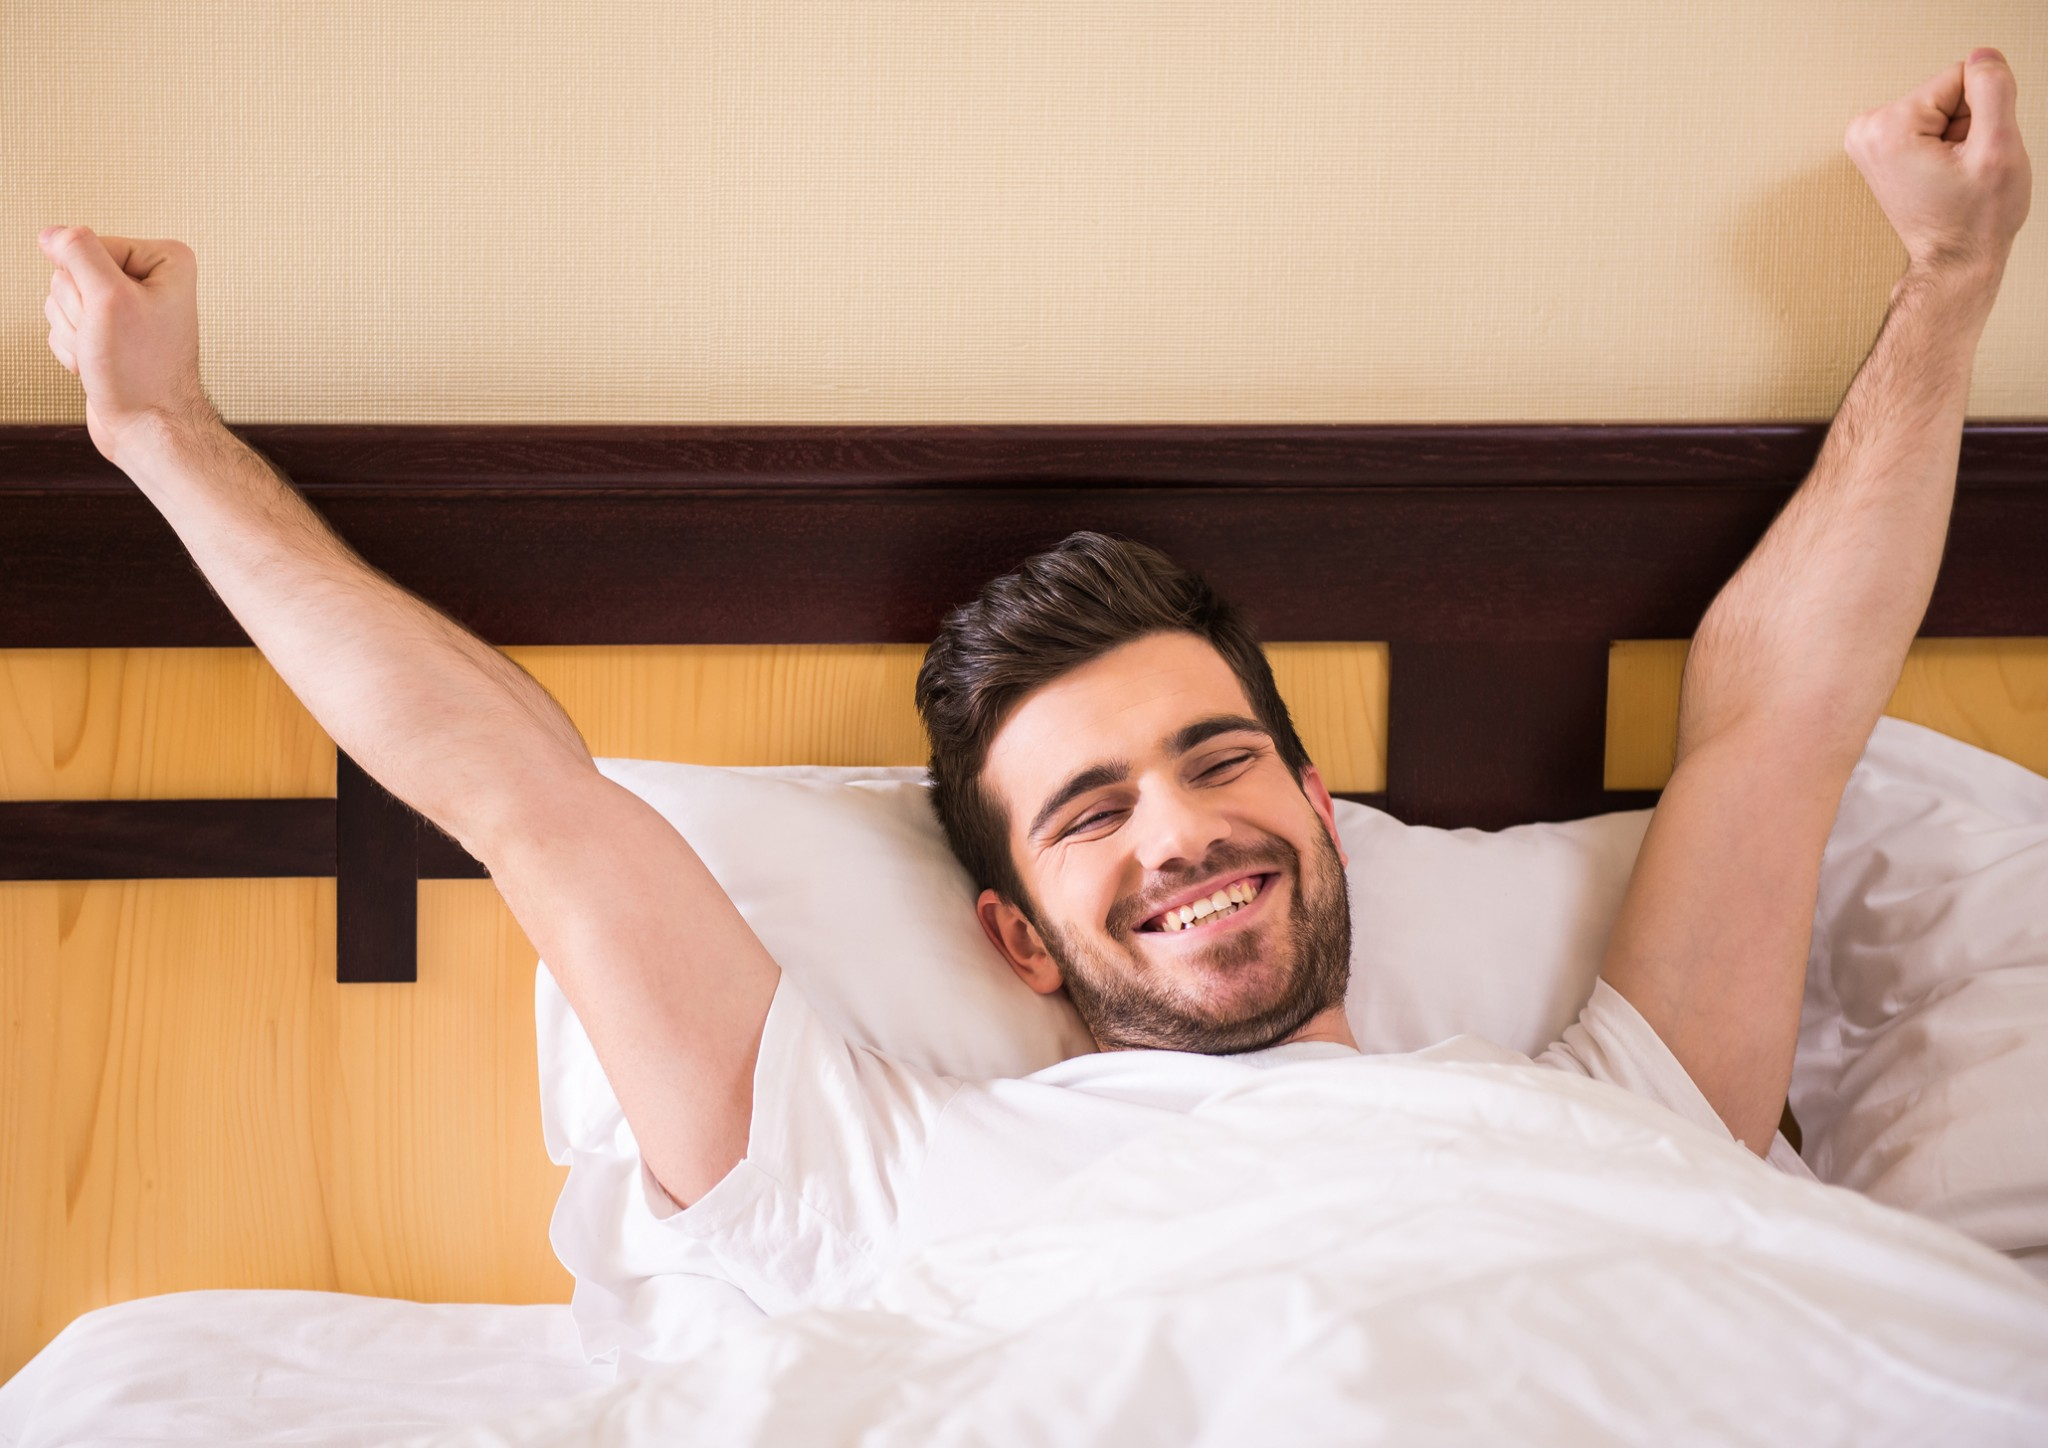 Man waking up happy